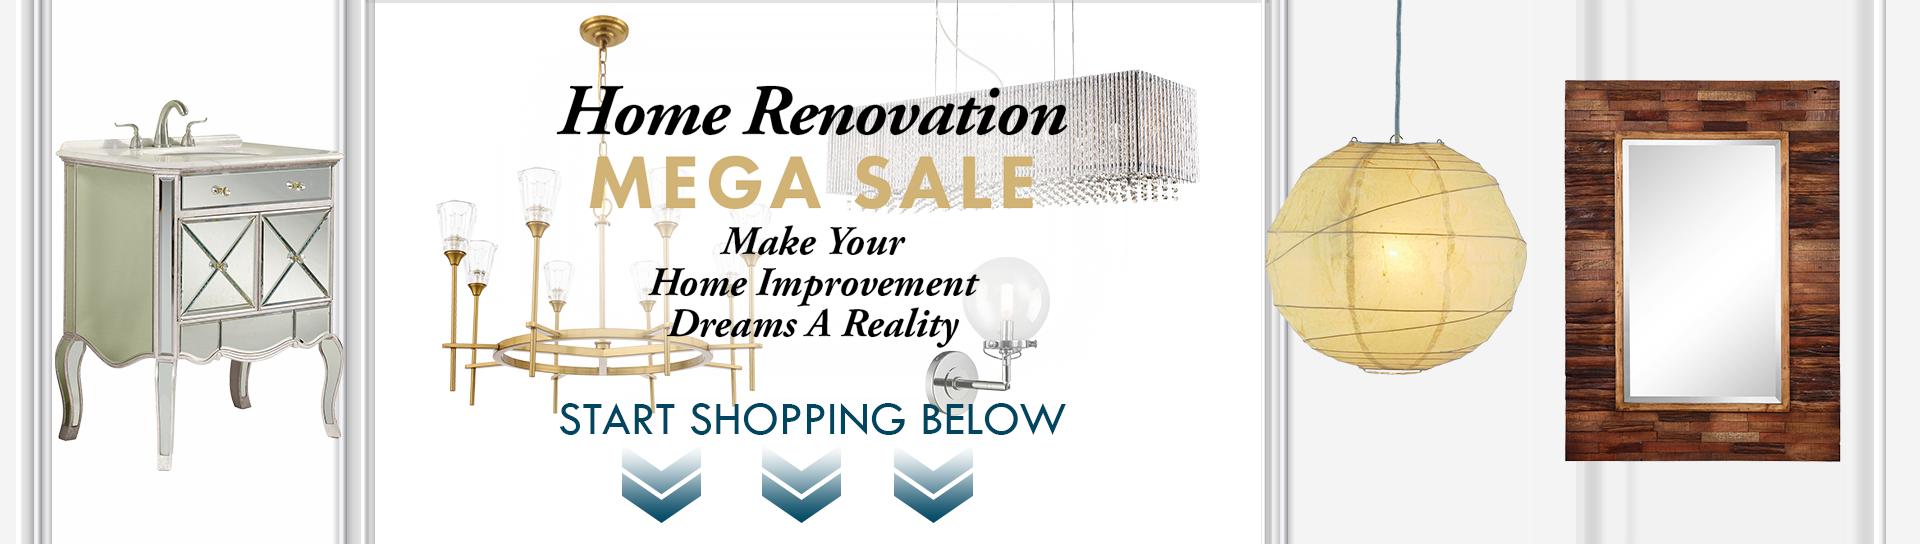 Lighting & Home Decor Renovation Sale